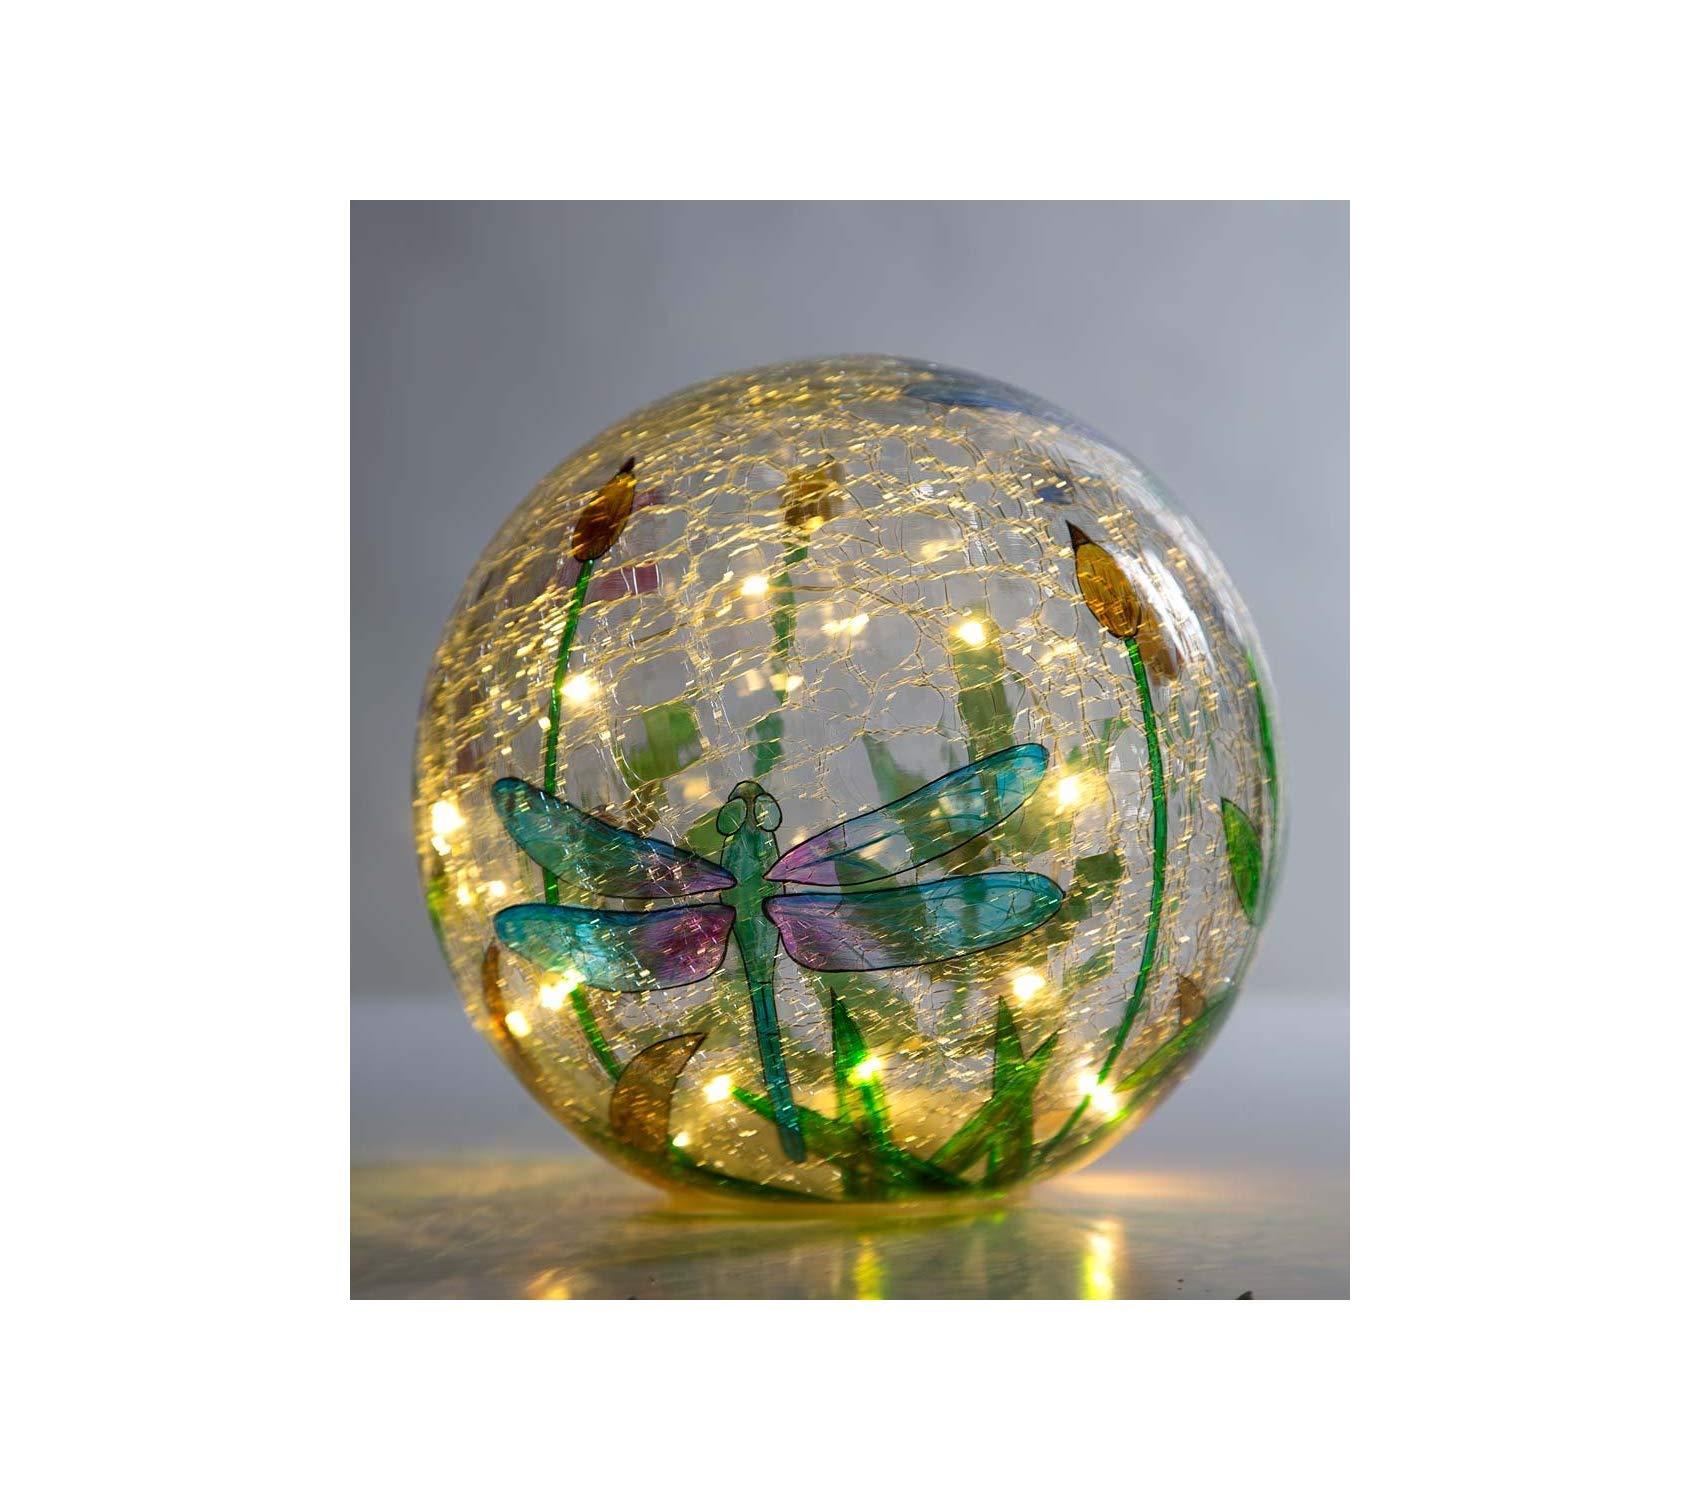 Outdoor Garden Backyard Décor Crackle-Glass Balls, Set of 3 Yard Art, Multi-Colored by Garden Décor (Image #3)